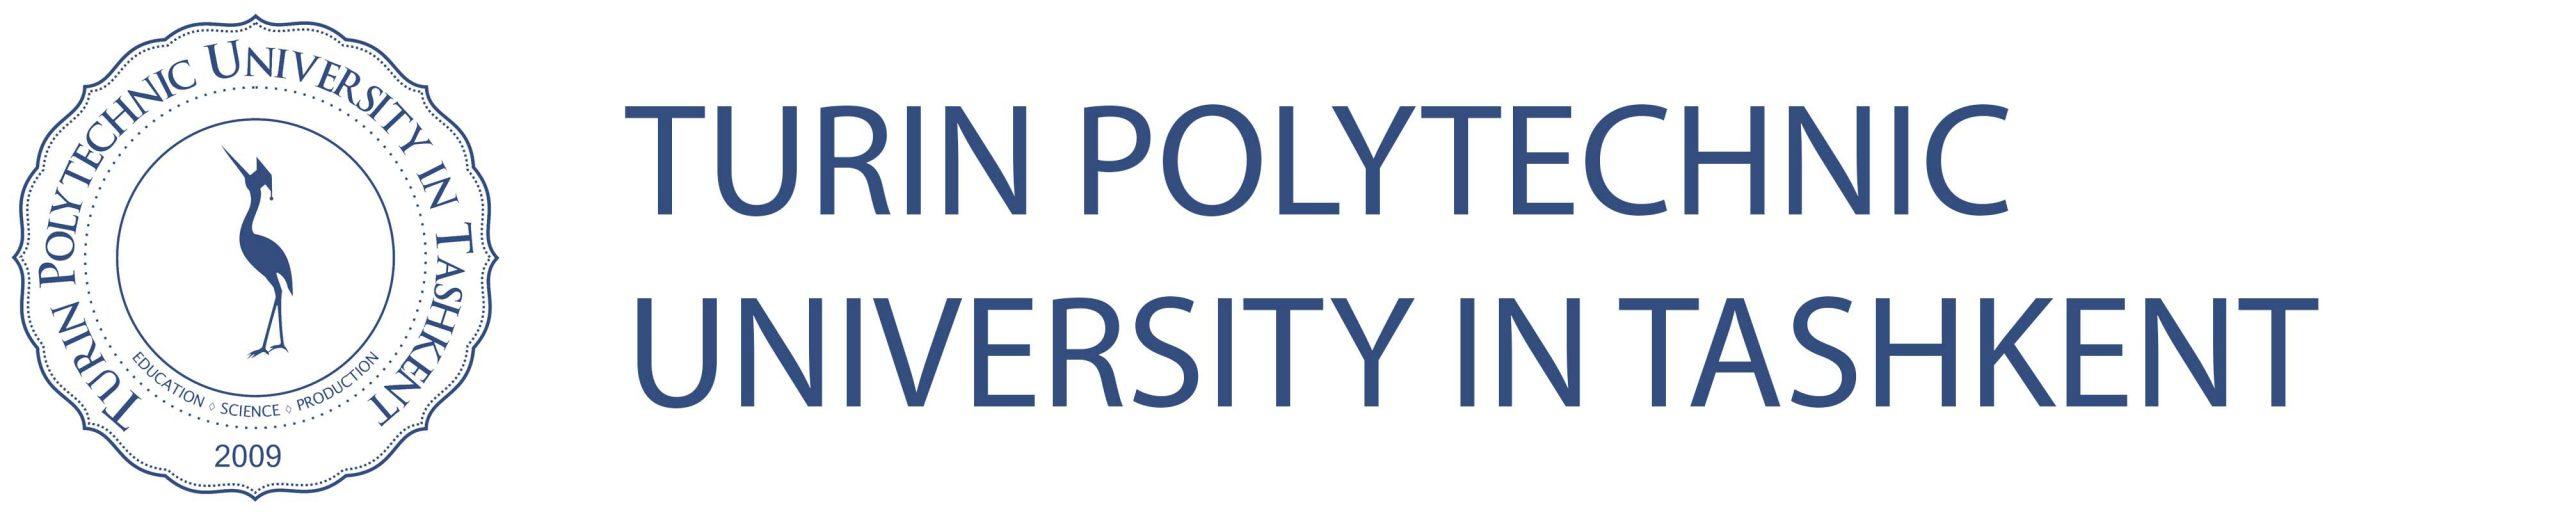 Turin Polytechnic University in Tashkent